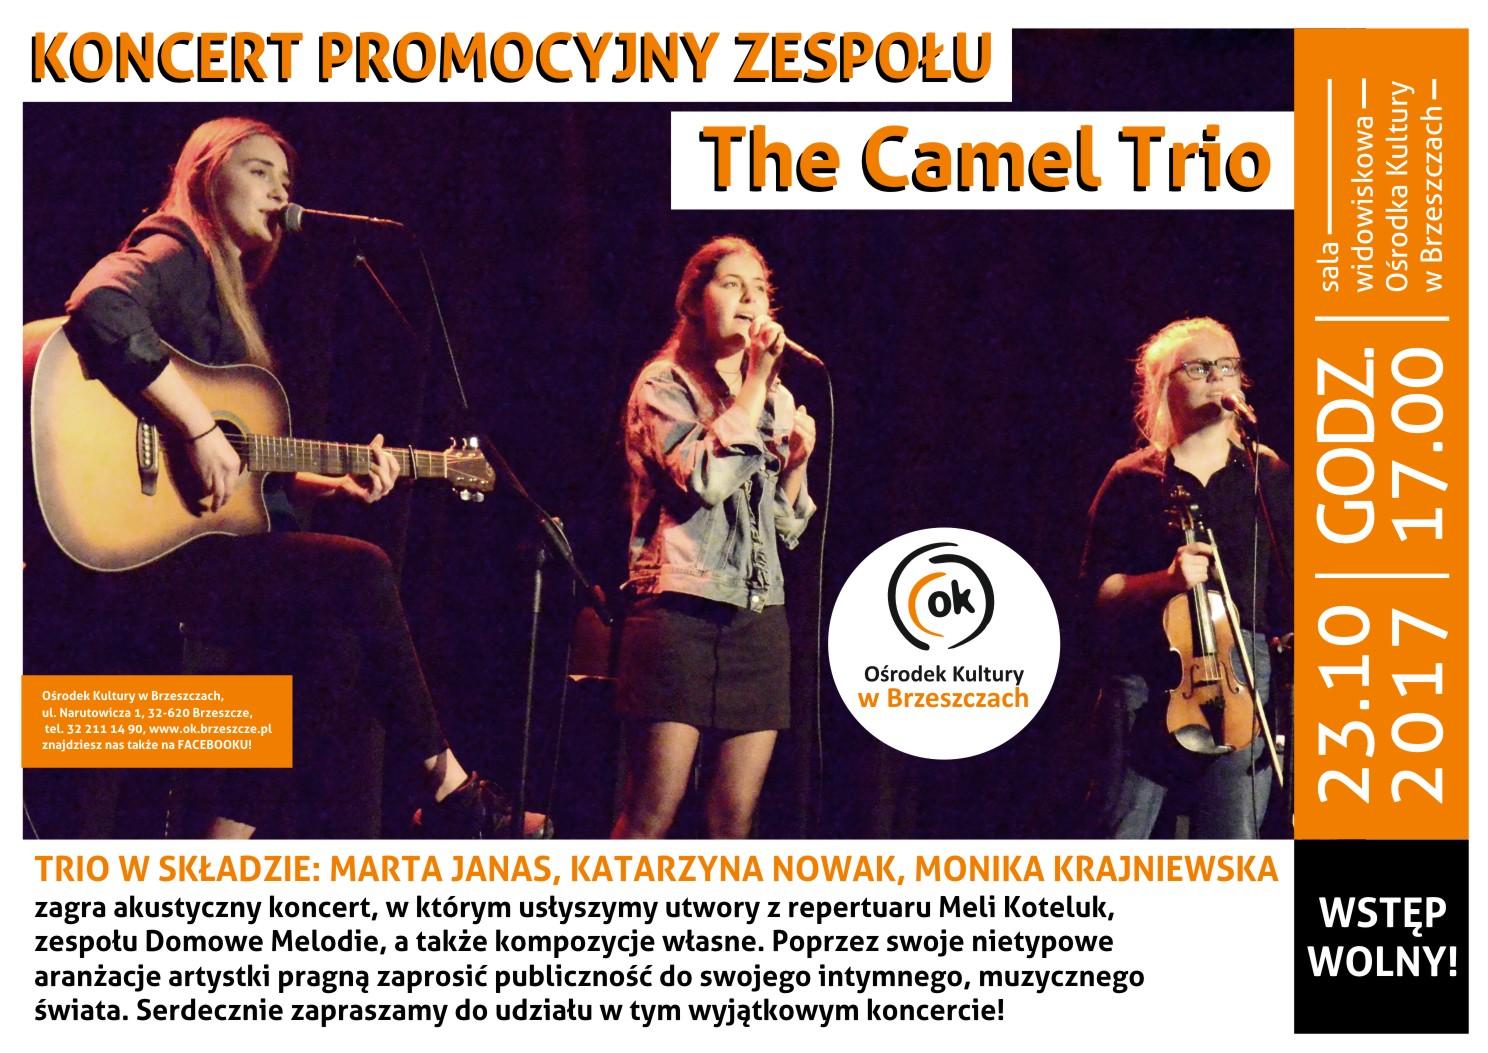 Koncert The Camel Trio